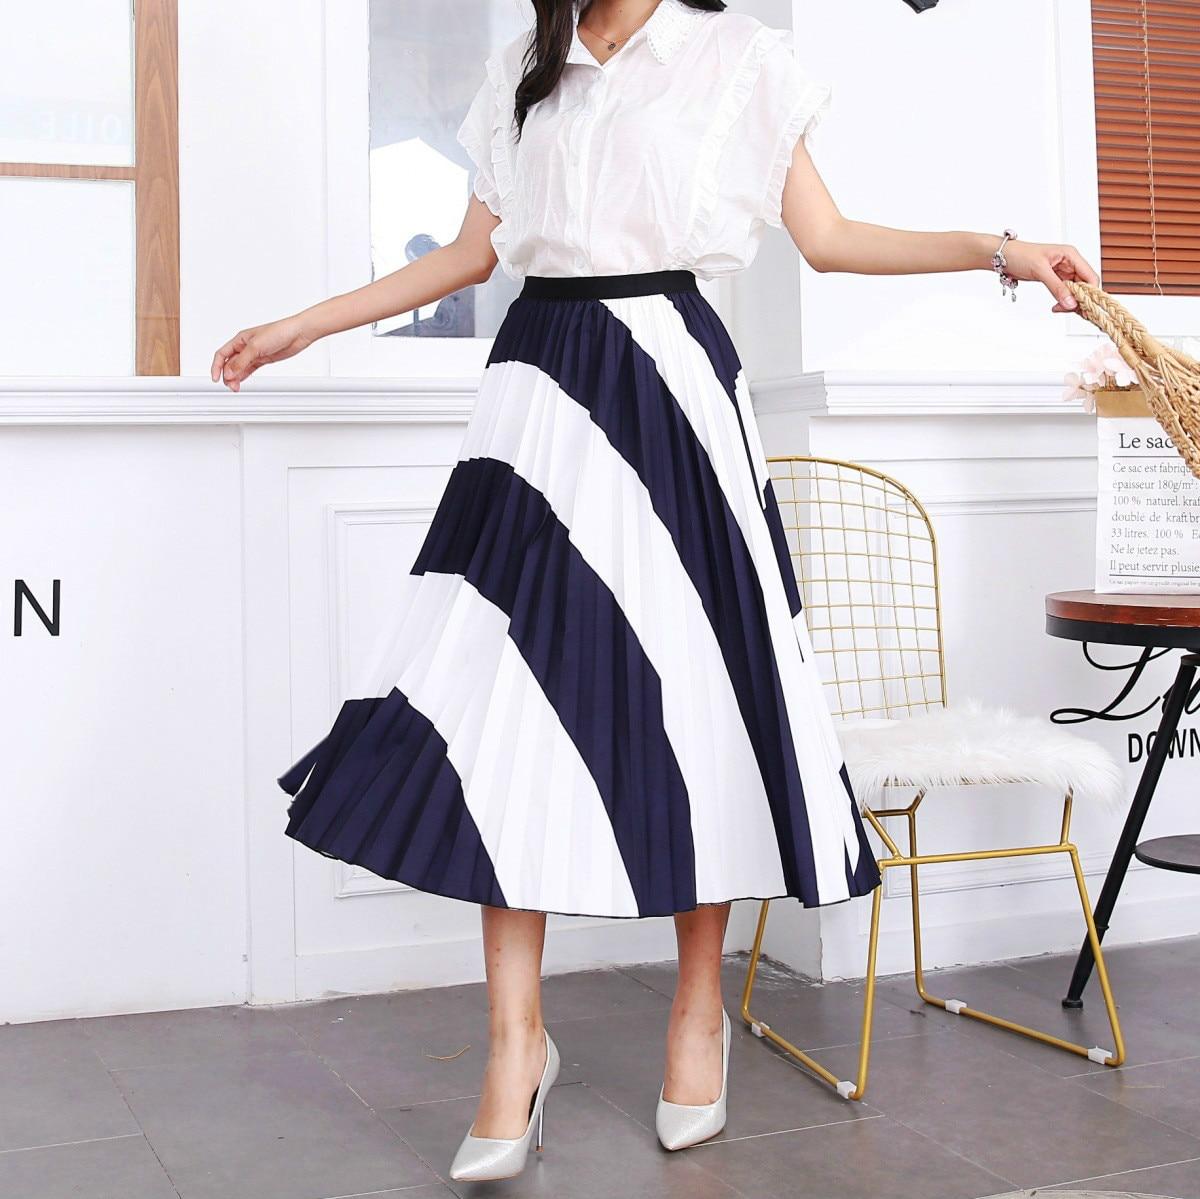 2020 New Summer Skirts Womens Butterfly Catroon Print Empire High Waist Elastci Pleated Midi Skirt European High Street Style 3